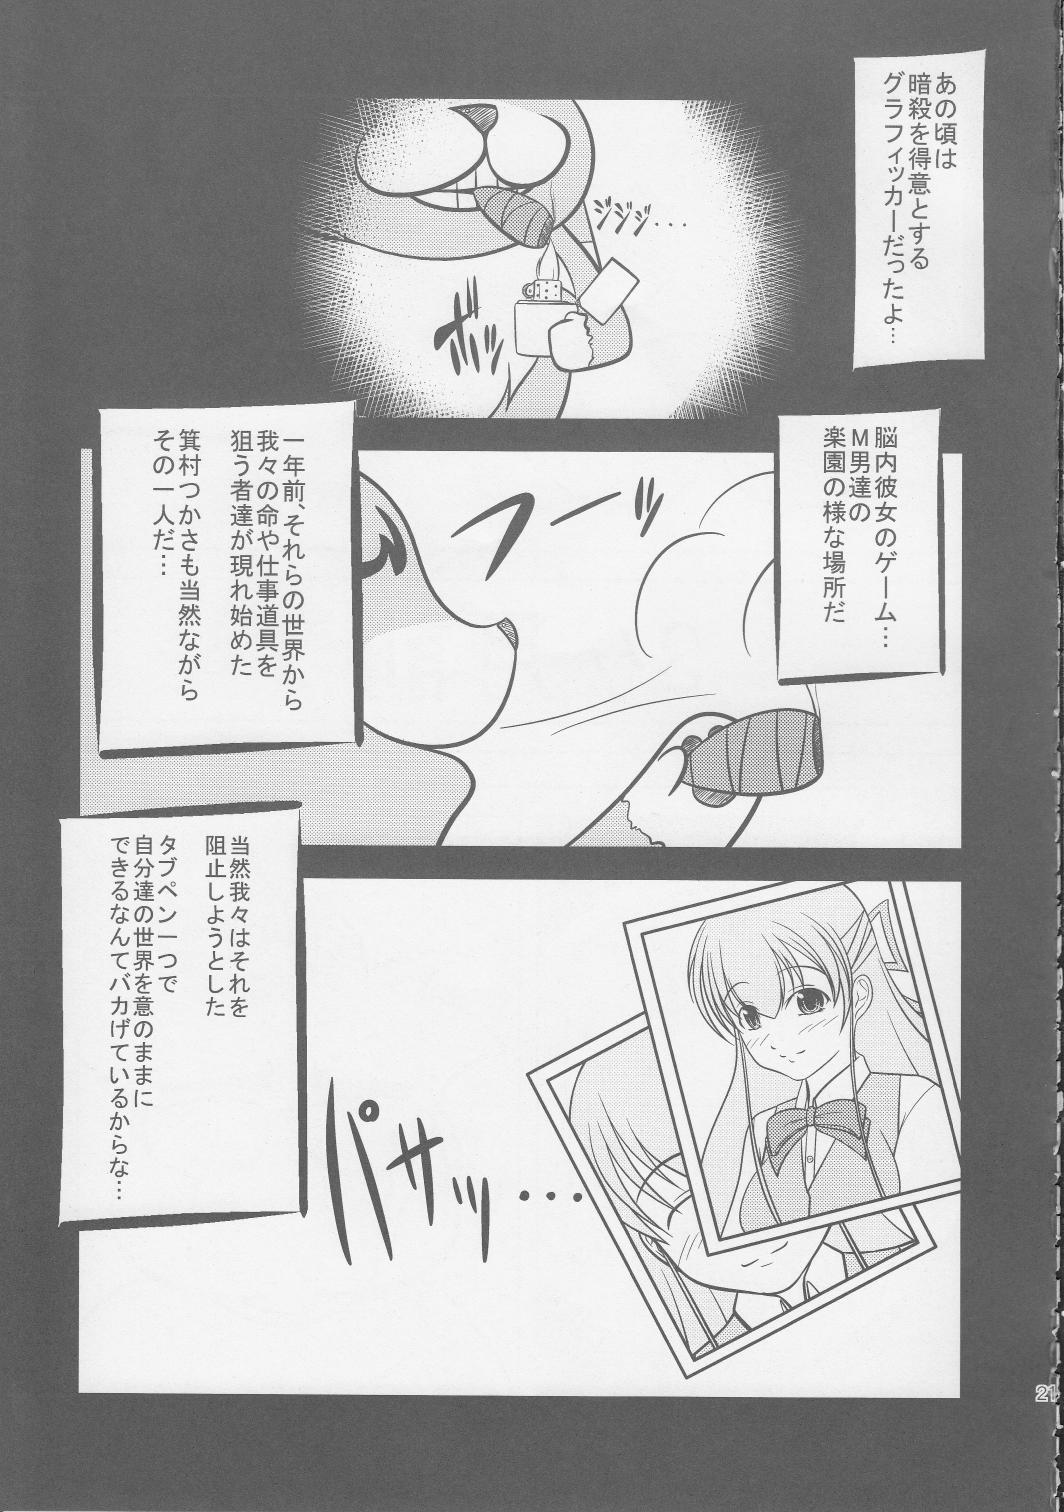 Musuko Maniacs! 19